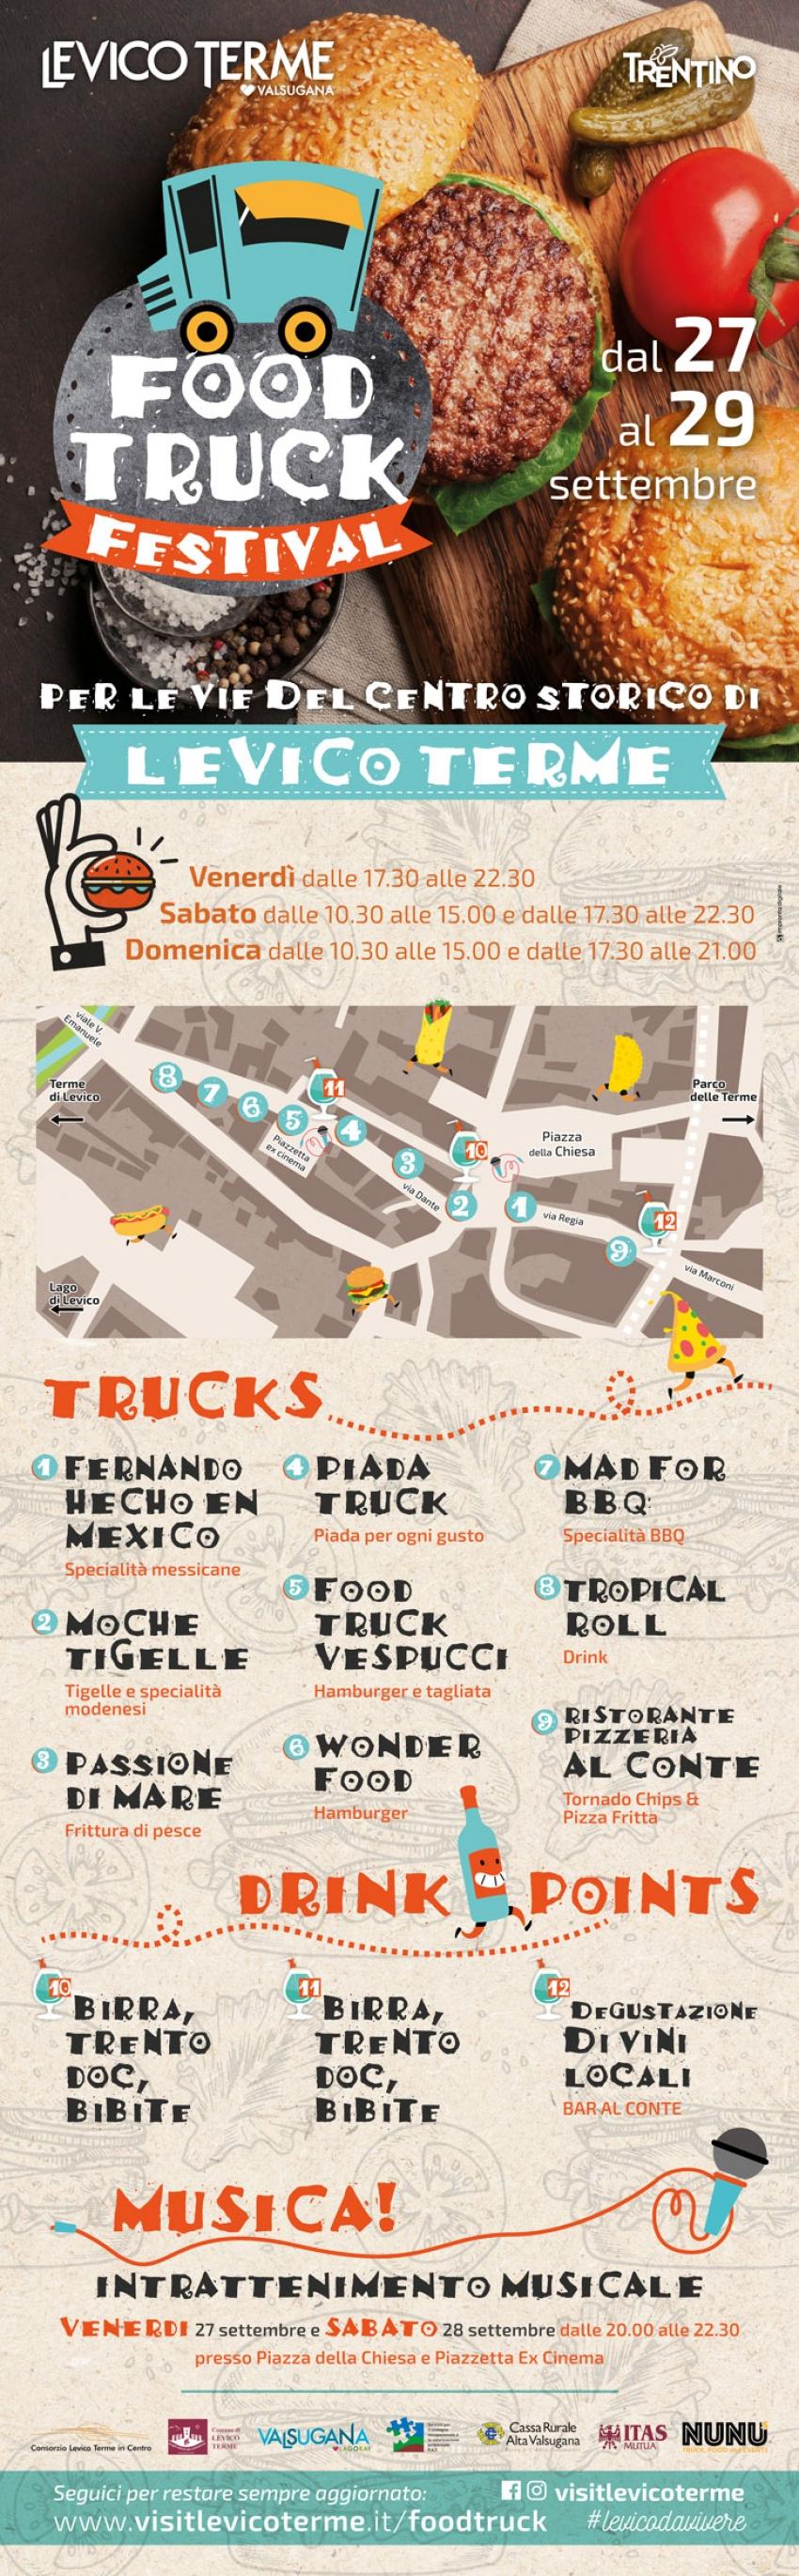 Totem-Food-Truck (1)